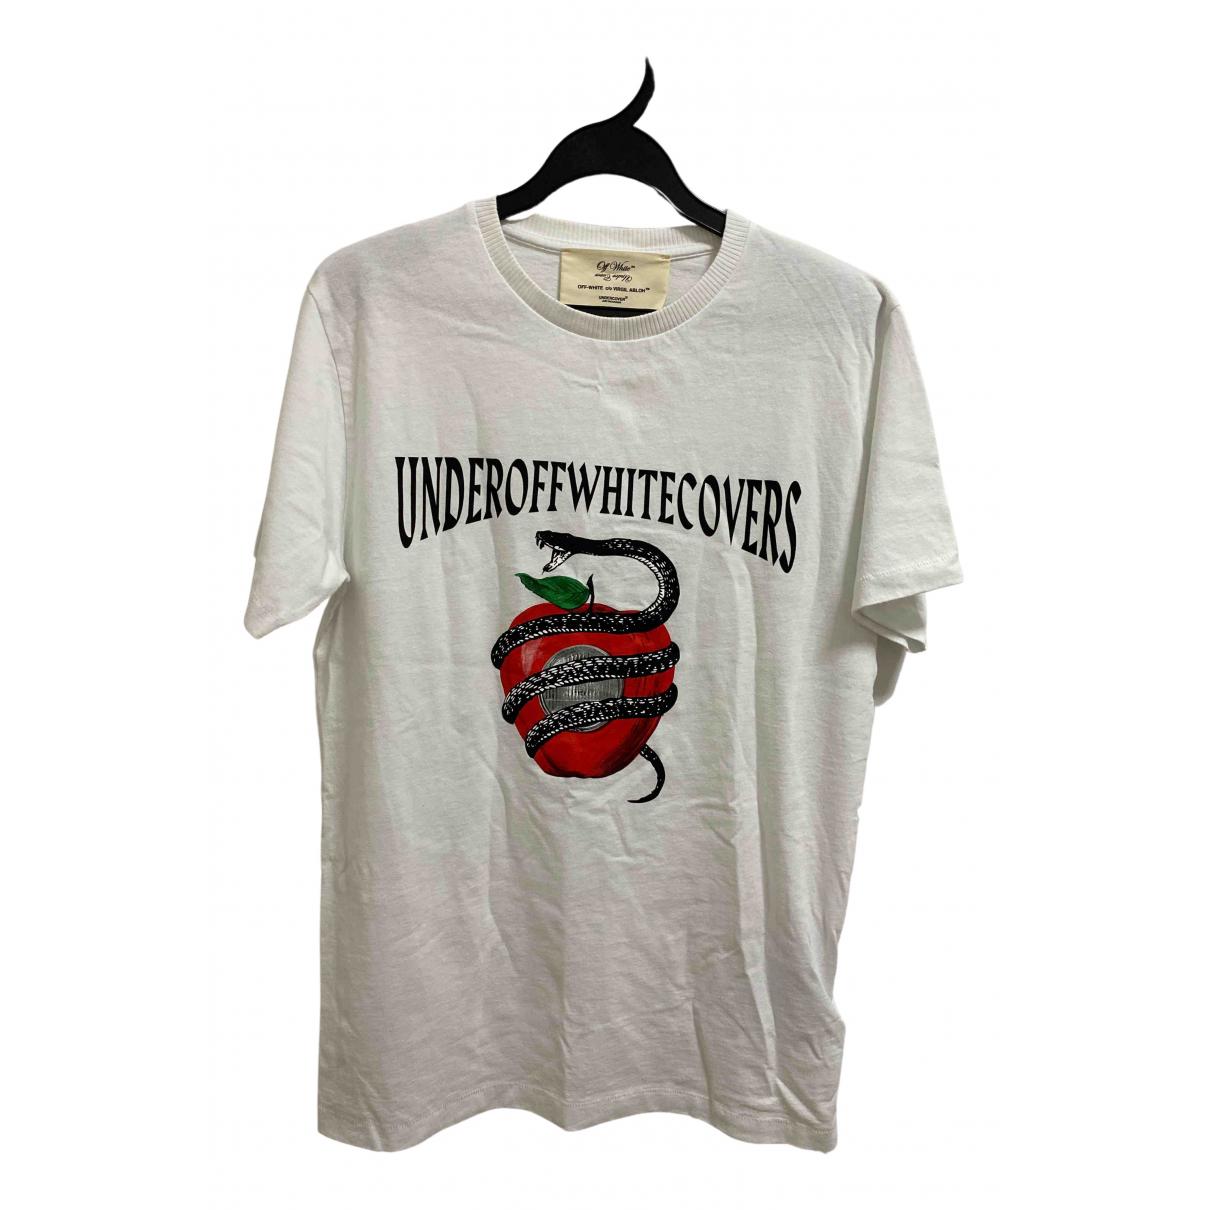 Off-white \N Ecru Cotton T-shirts for Men S International